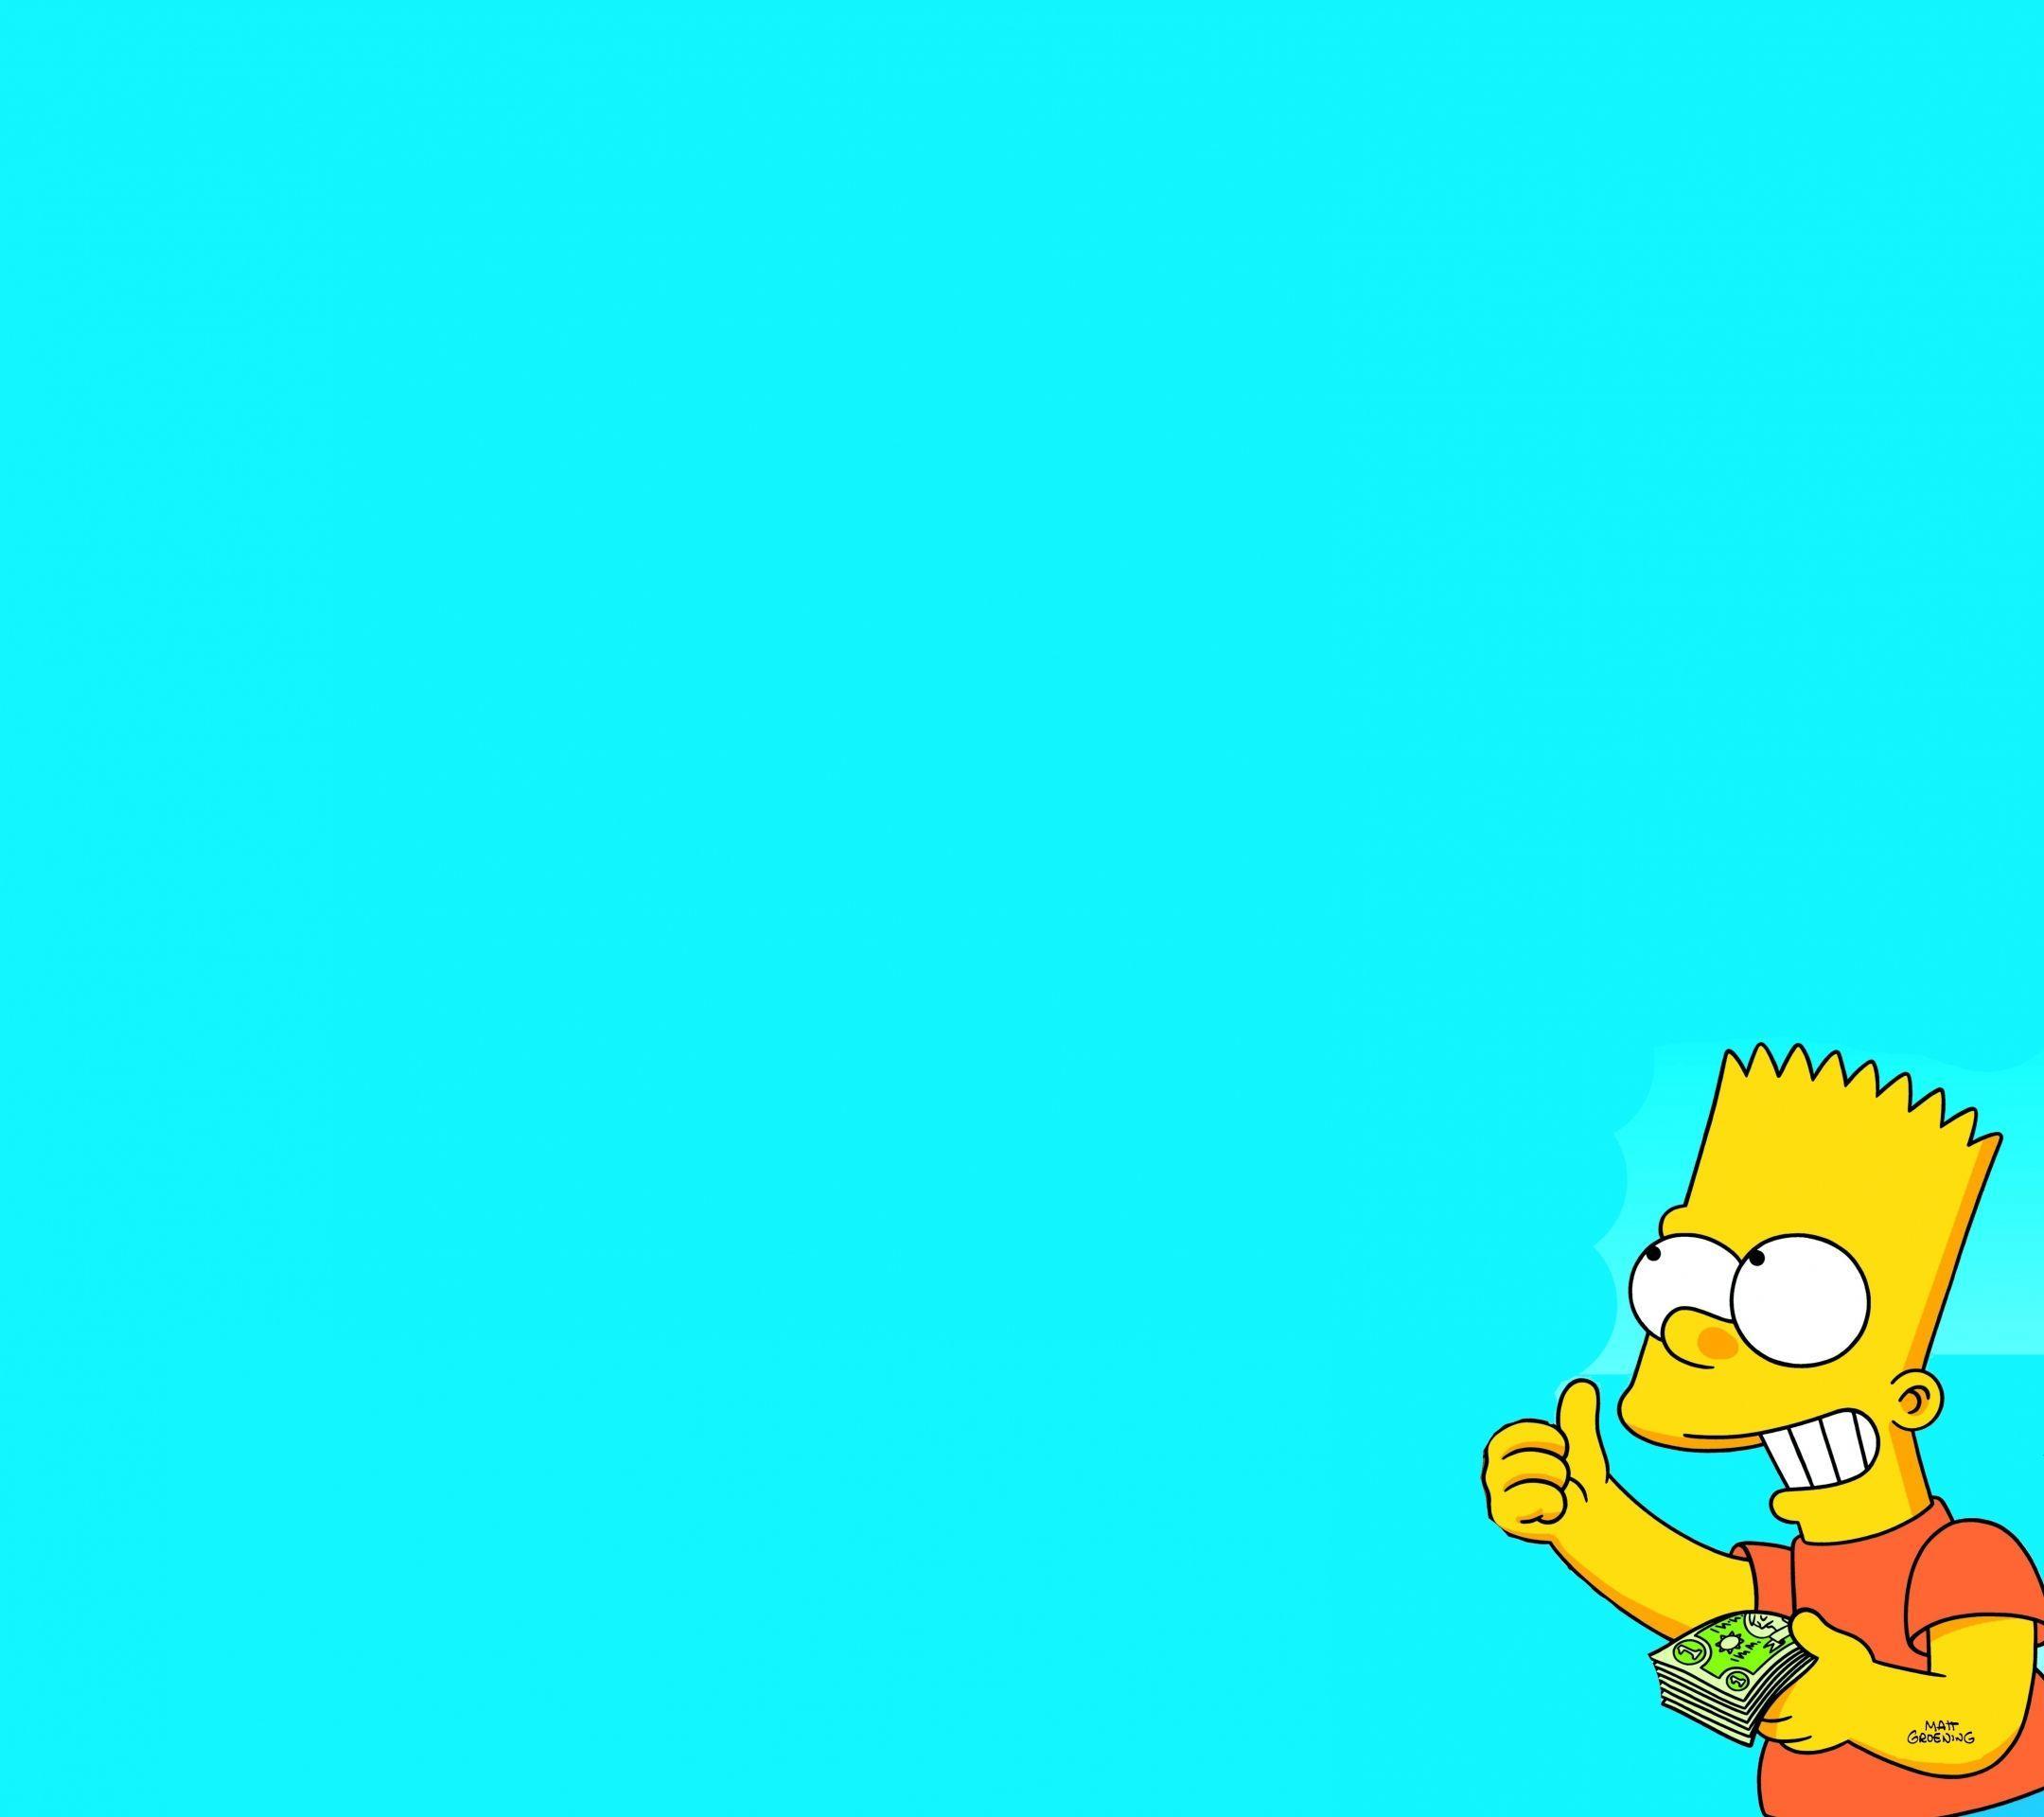 Galaxy J2 - TV Show/The Simpsons - Wallpaper ID: 162696